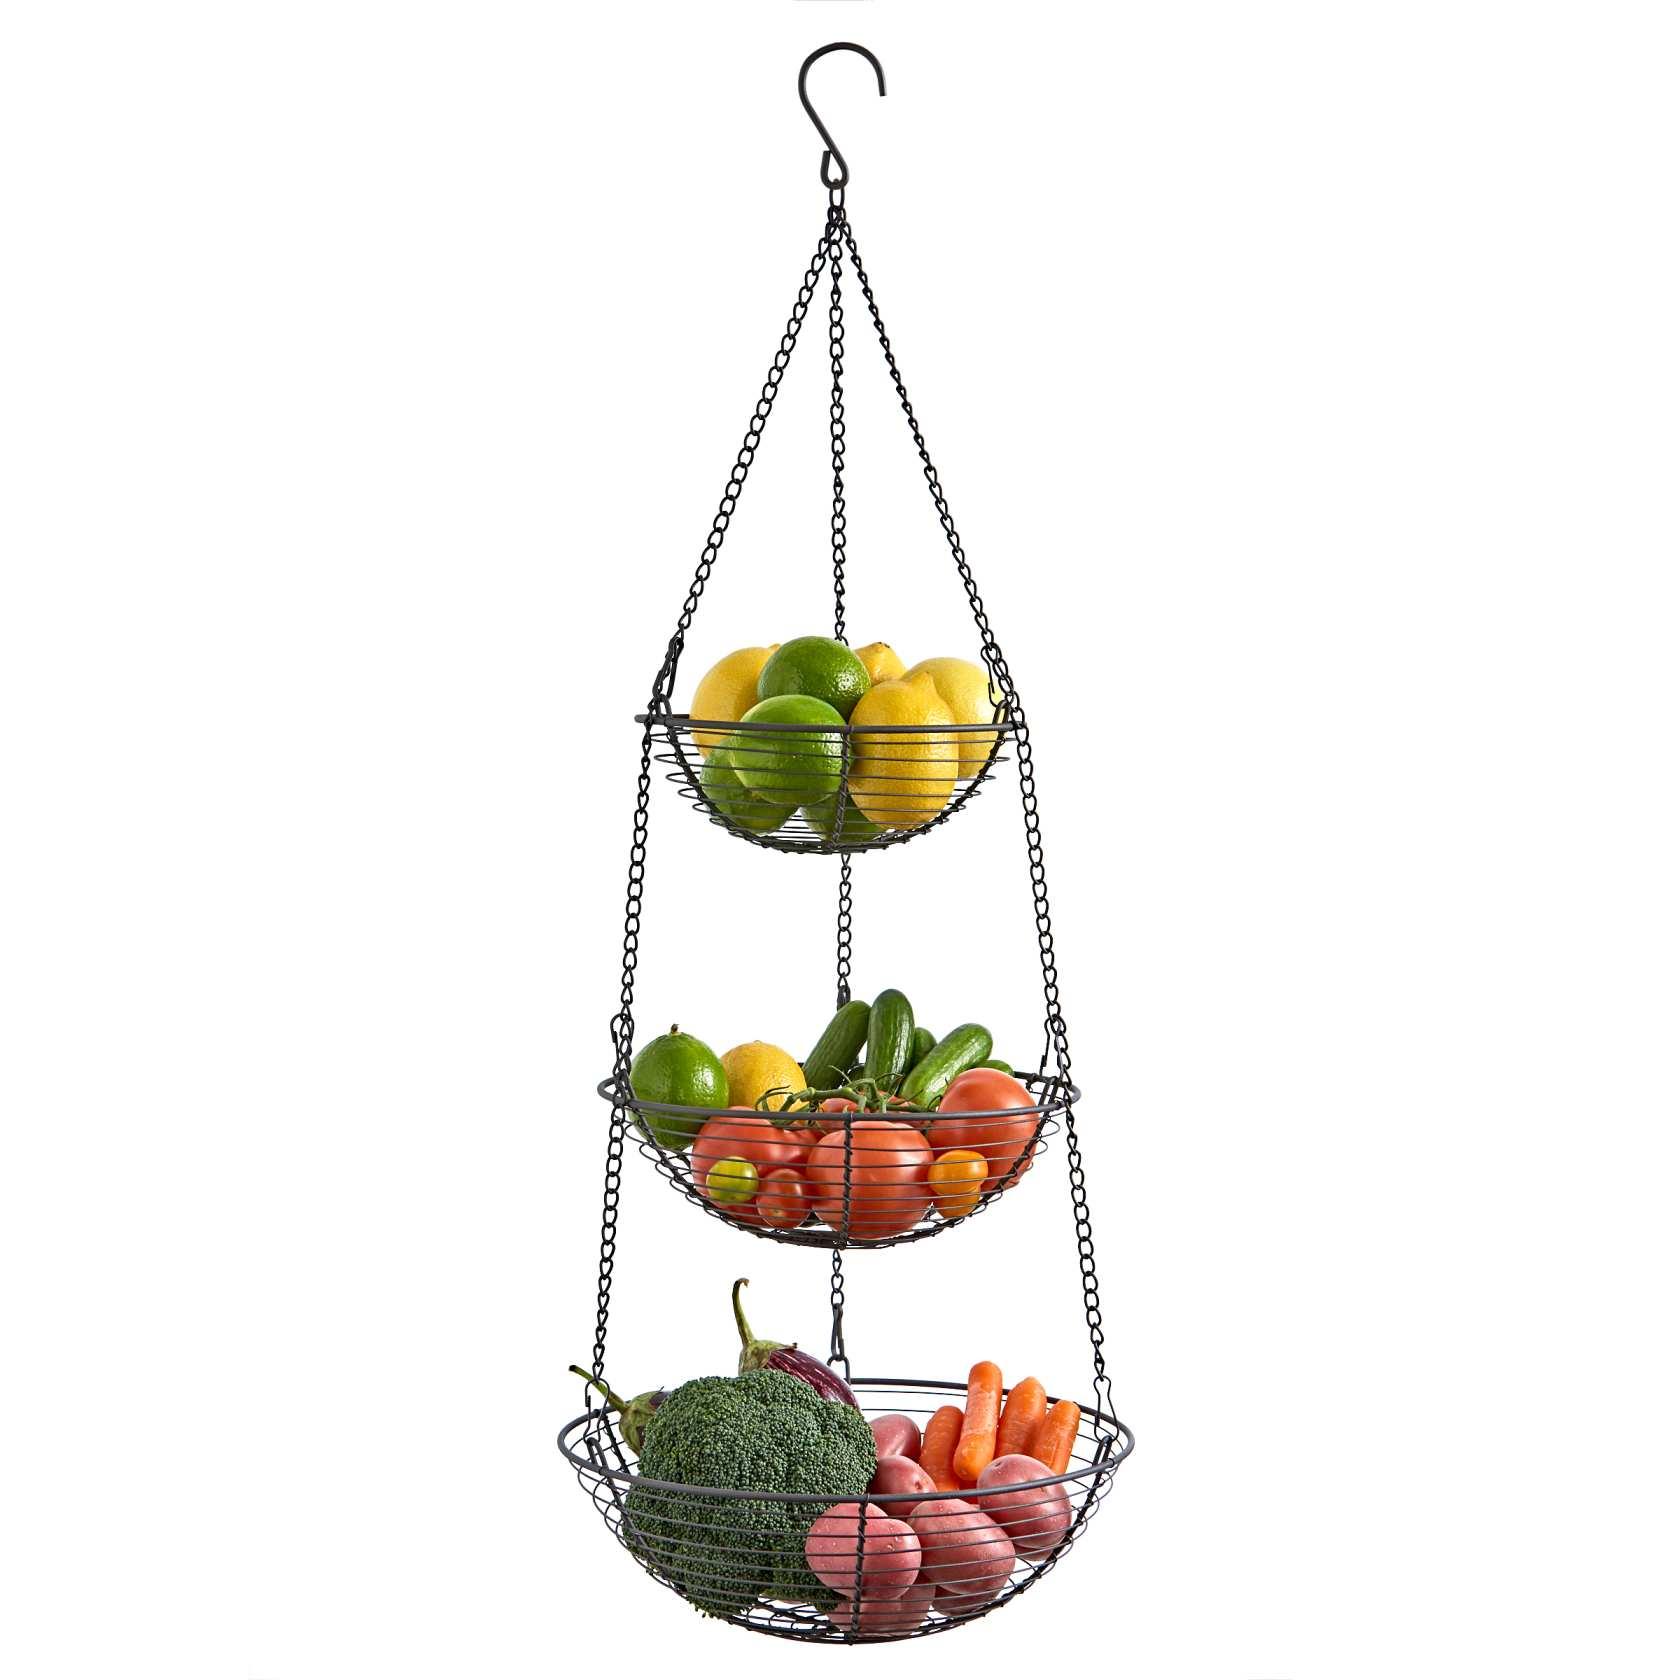 3 Tier Wire Hanging Basket